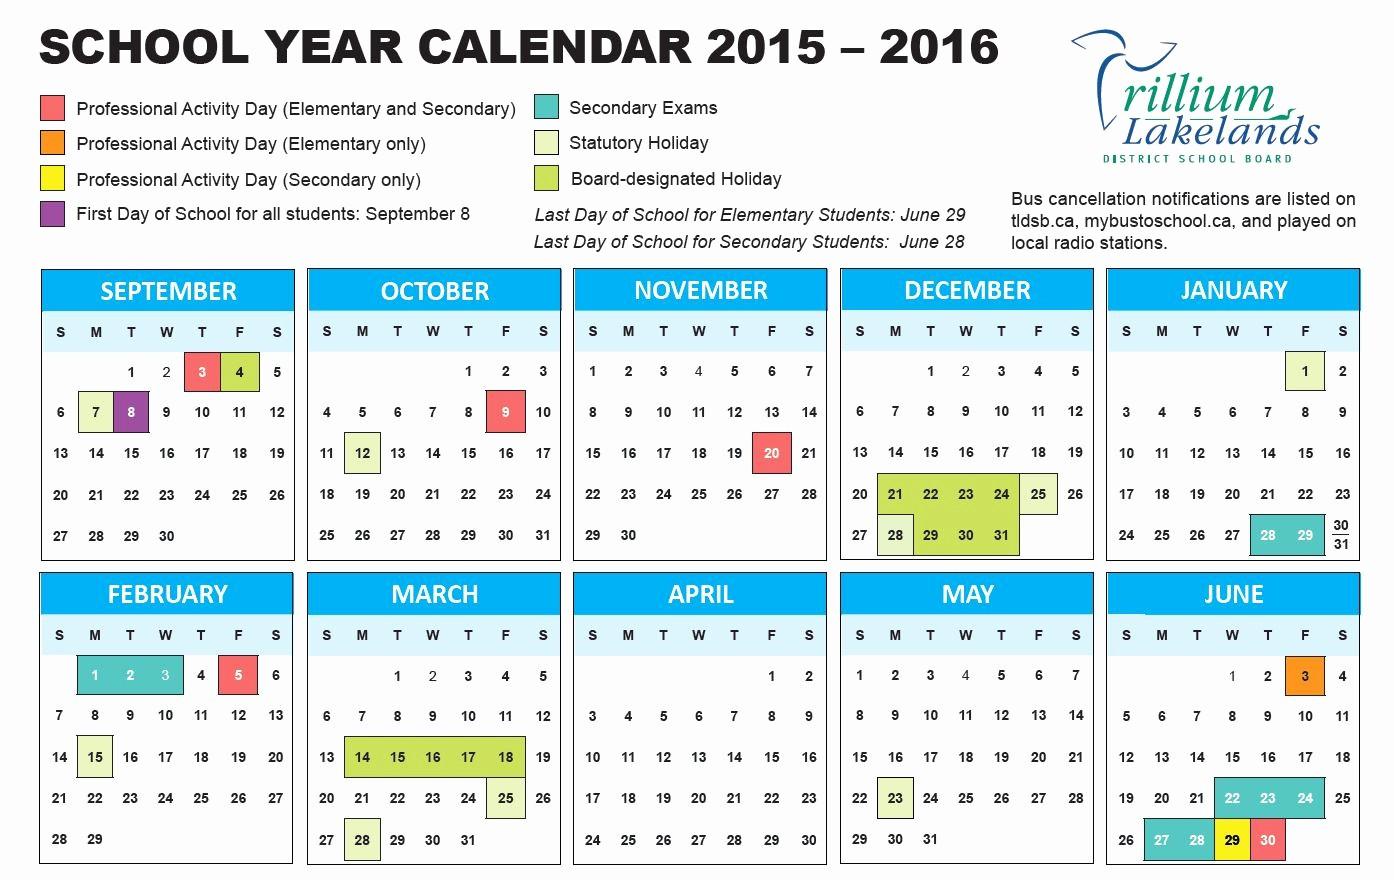 5 Year Calendar Starting 2016 New School Year Calendar Trillium Lakelands District School